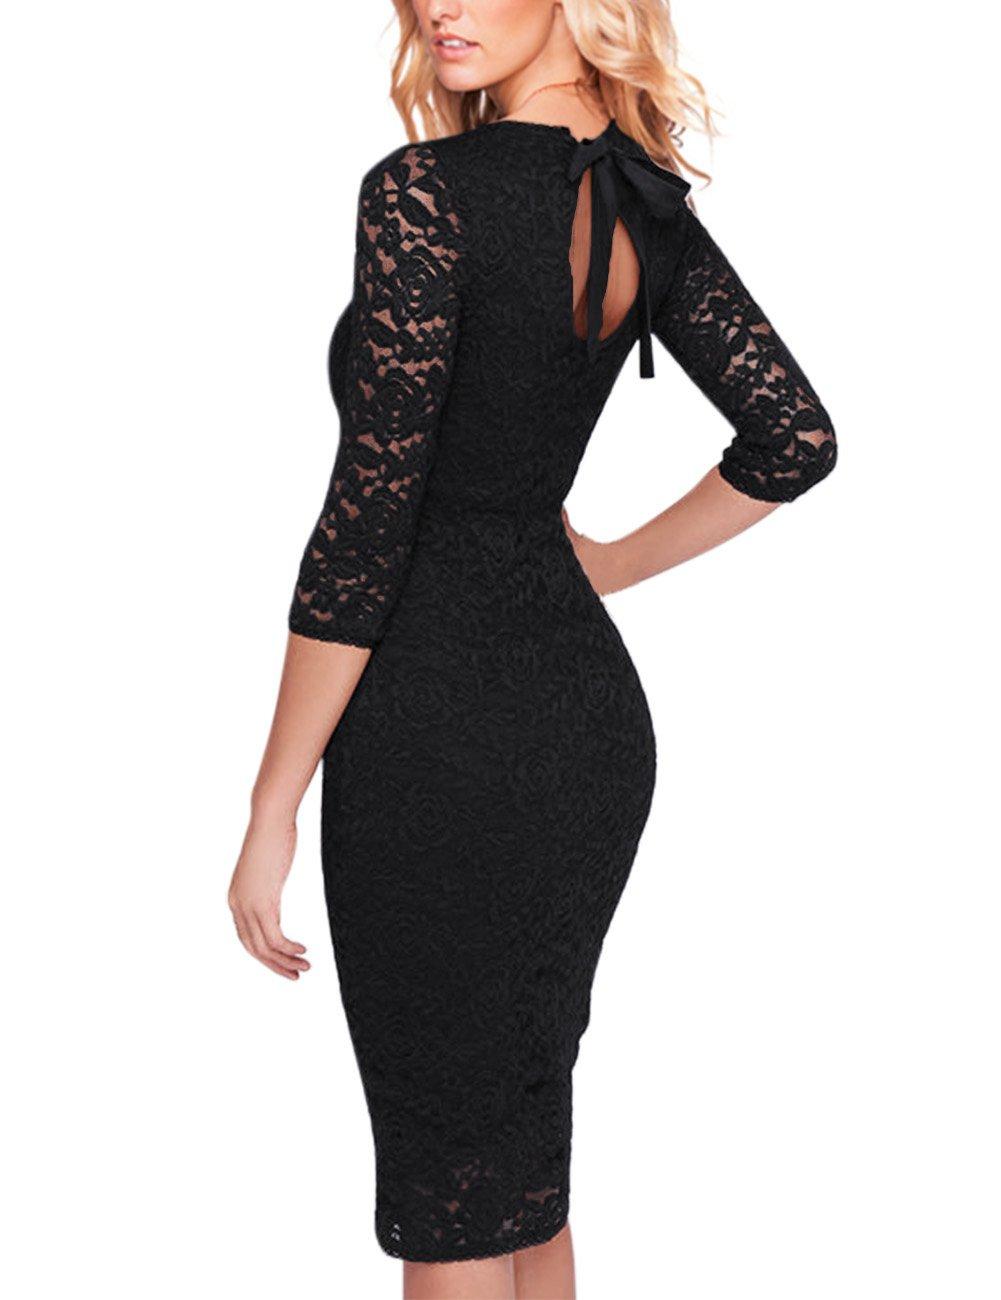 GlorySunshine Women Floral Lace Back Strap Short Lace Bodycon Cocktail Dress (M, New Black)